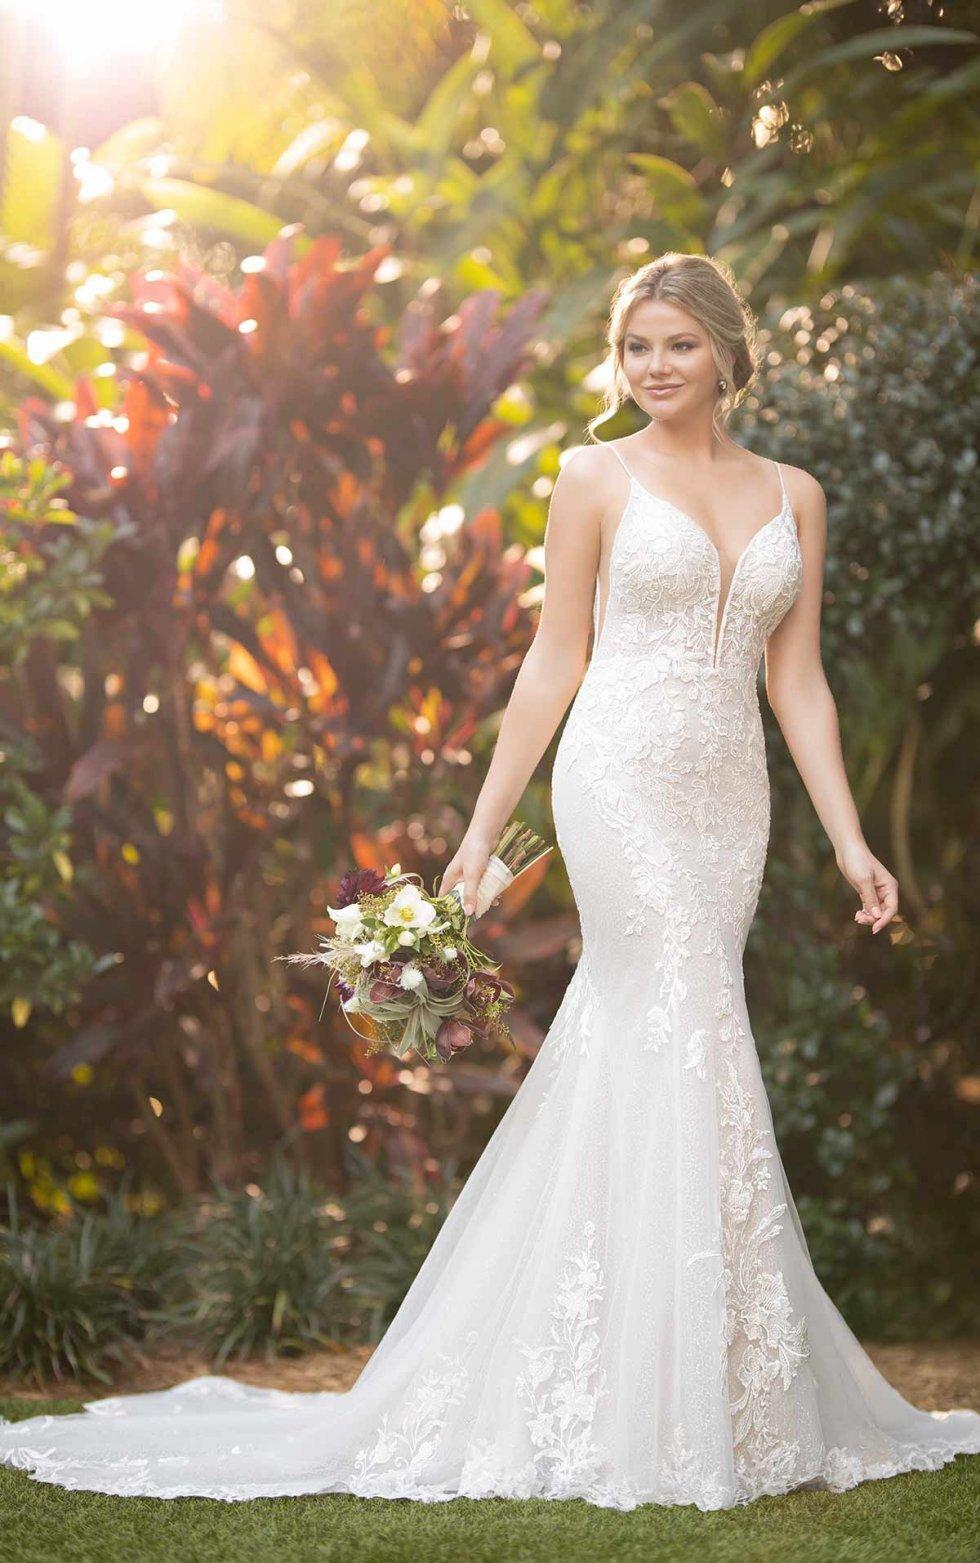 Essense Of Australia Wedding Dresses Here Comes The Bride Wedding Dresses Plus Size Wedding Dresses,Beautiful Wedding Dresses For Skinny Brides